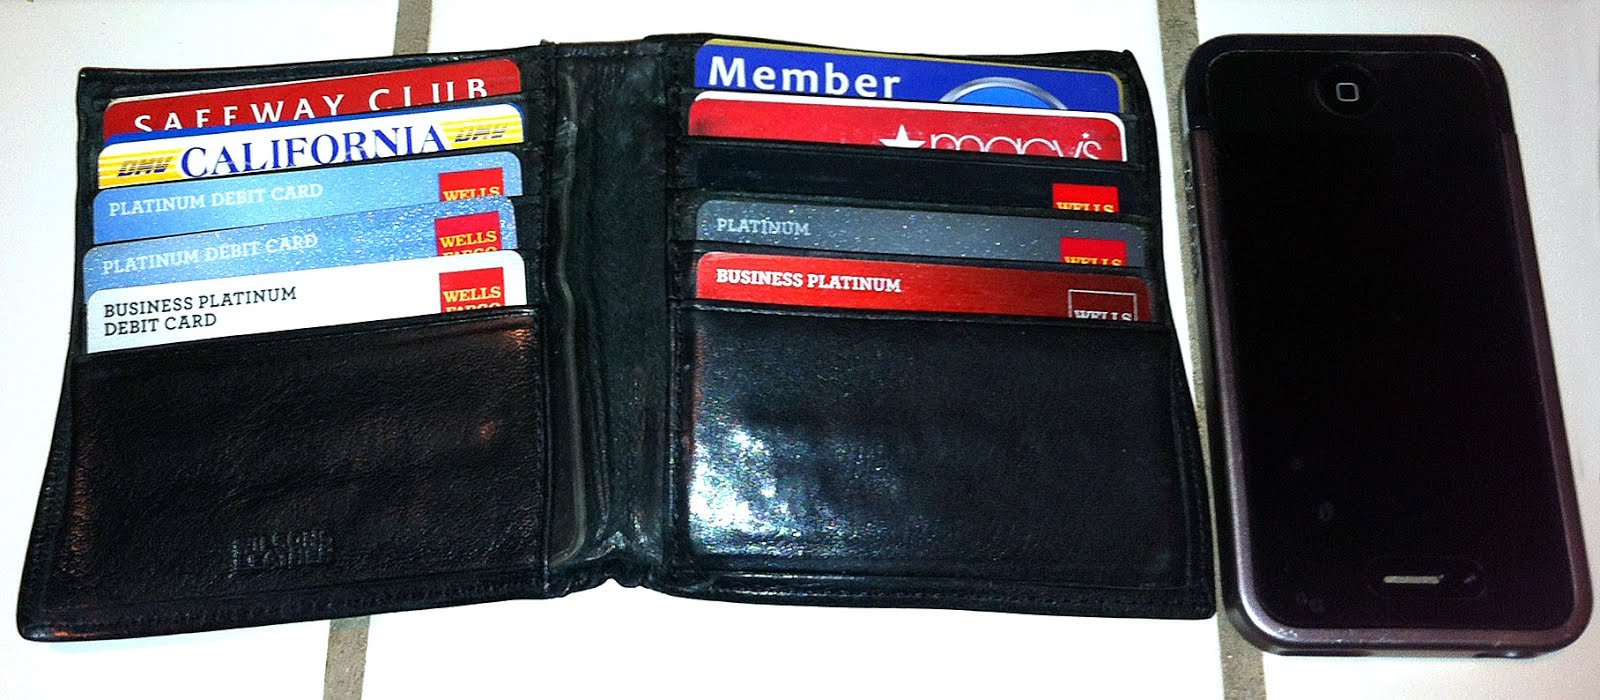 BulletTrain BulletBlog by JakeE: Wallet Autopsy #2 The Organized Packrat